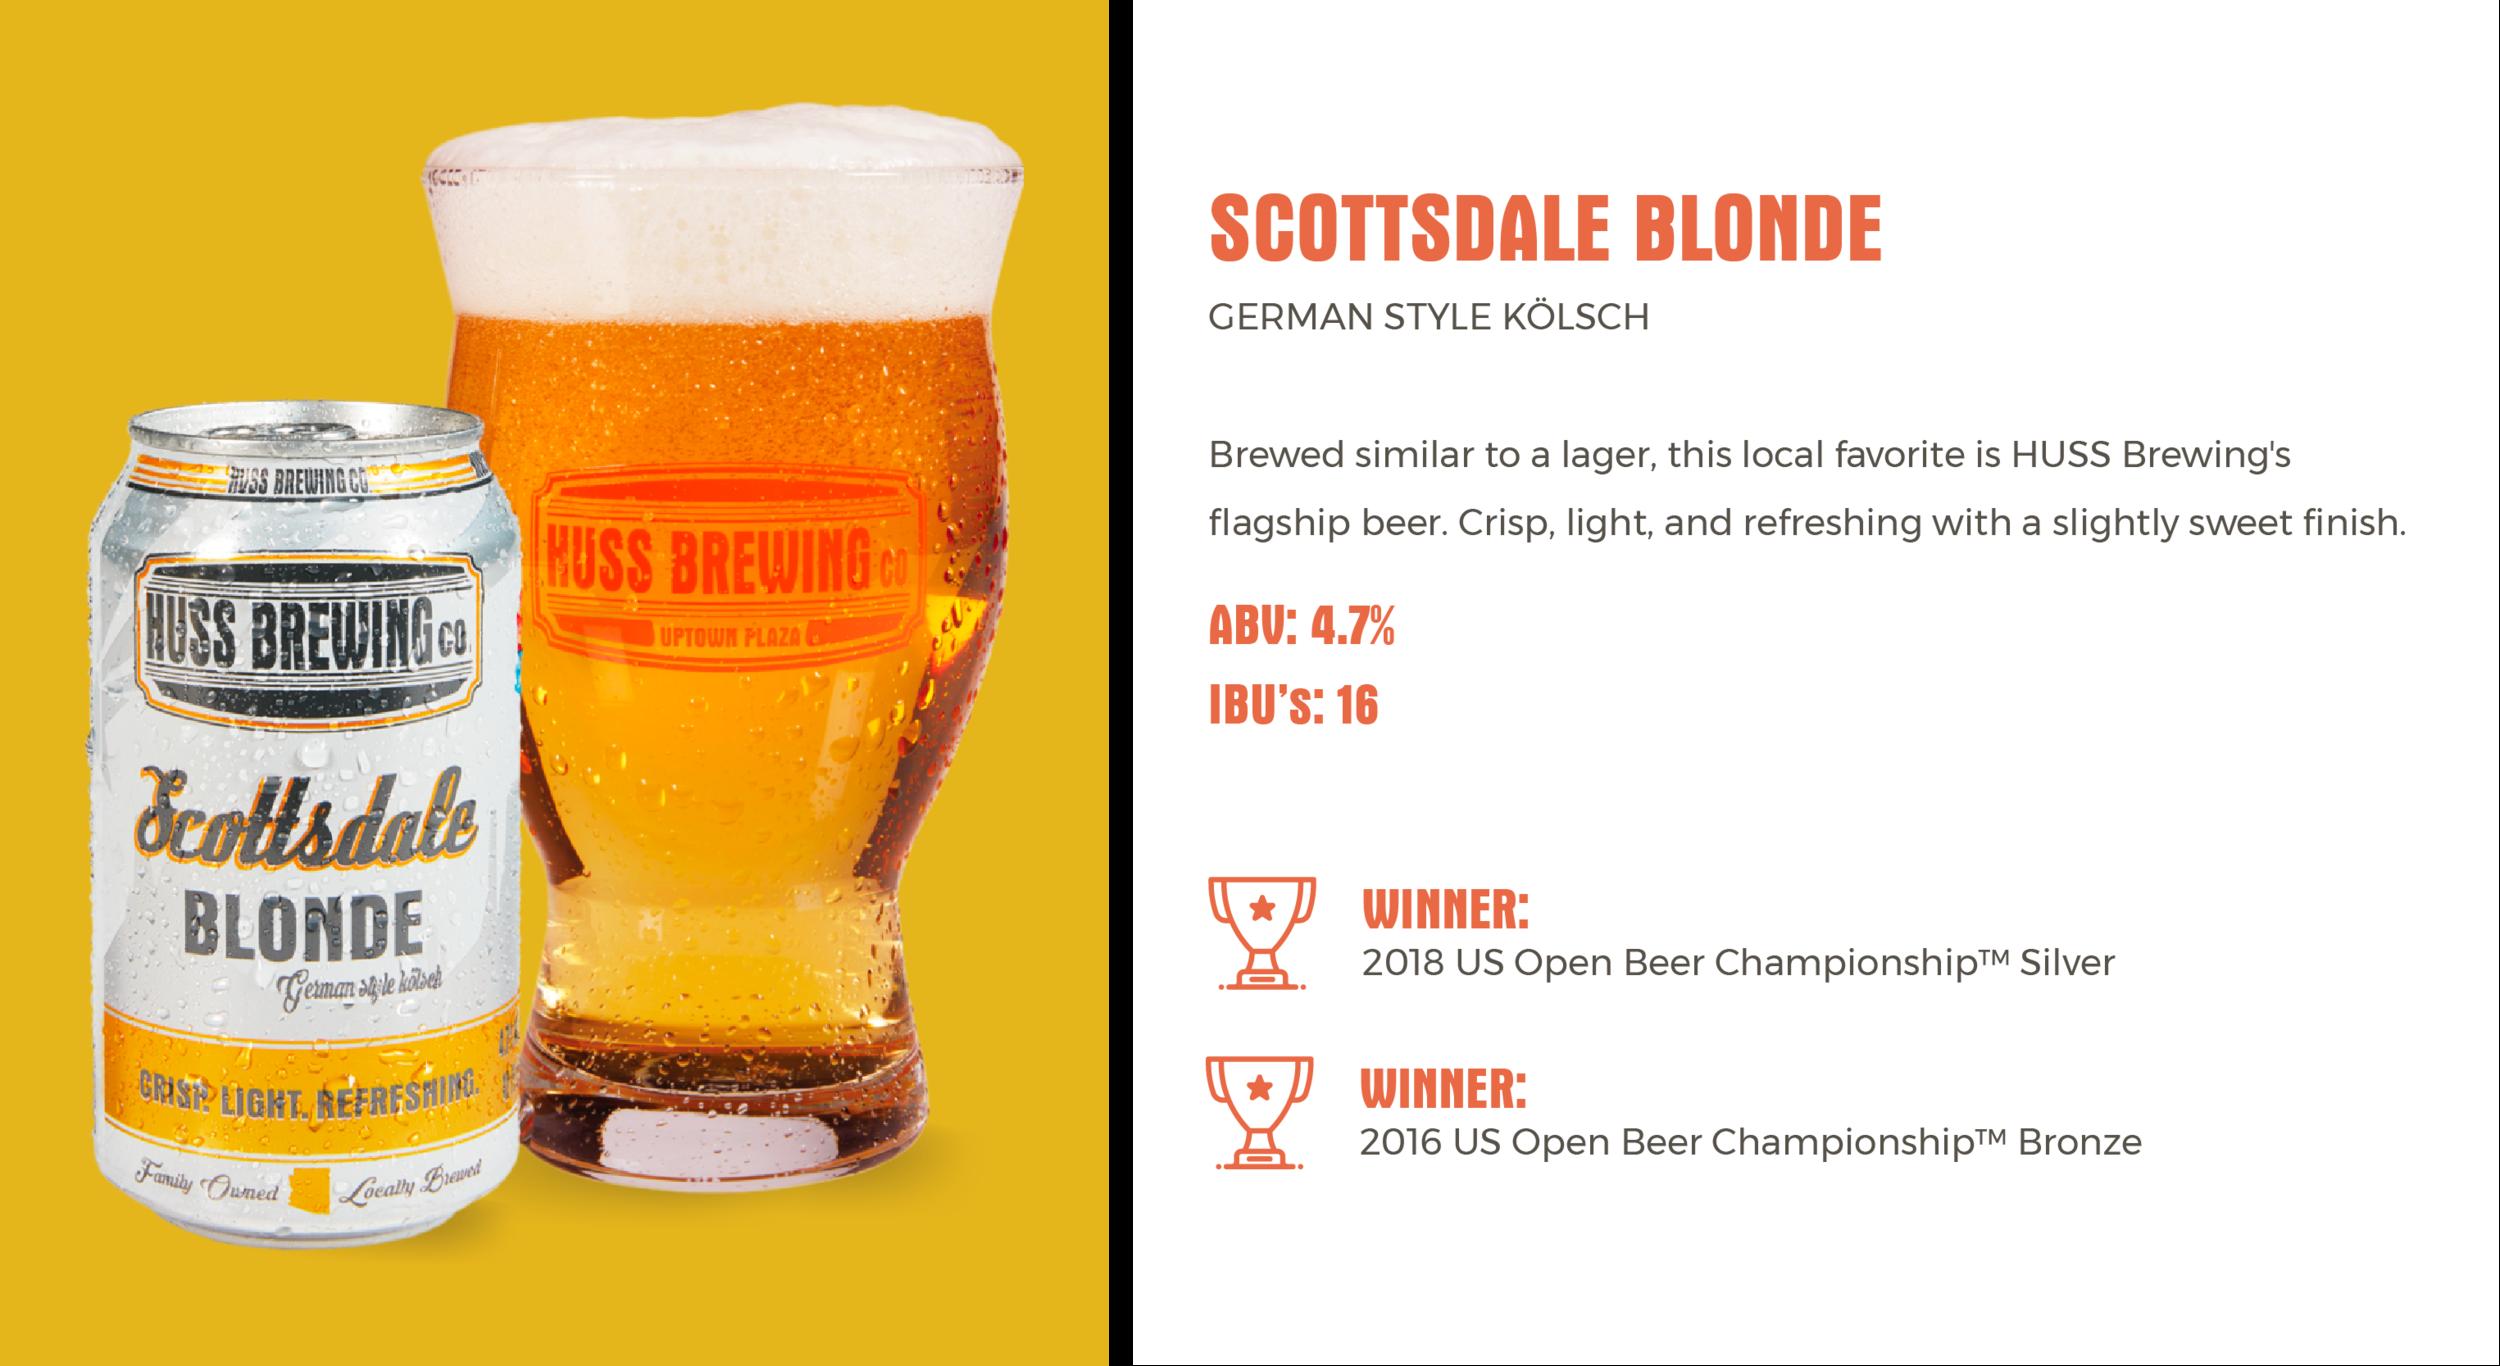 Huss Brewing Co Scottsdale Blonde